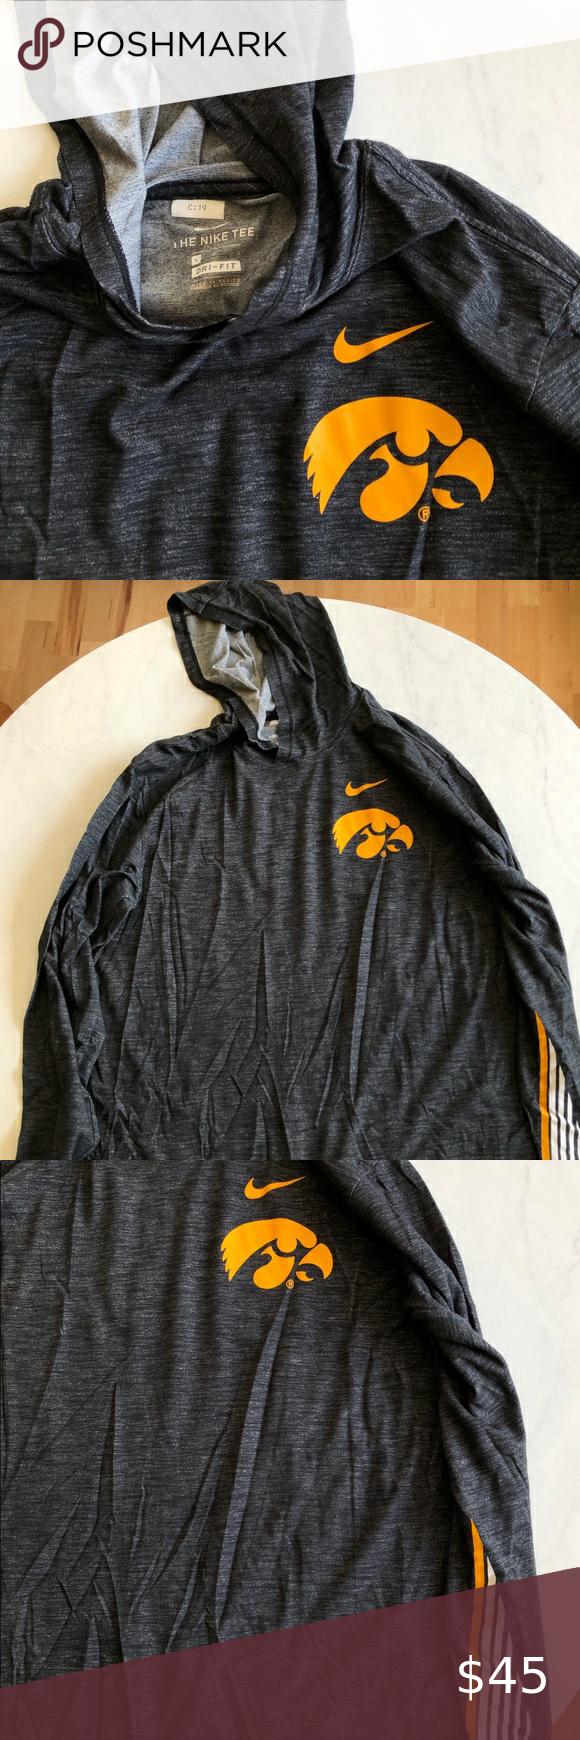 Iowa Hawkeyes Light Weight Drifit Sweatshirt Shirt Clothes Design Sweatshirts Hoodie [ 1740 x 580 Pixel ]